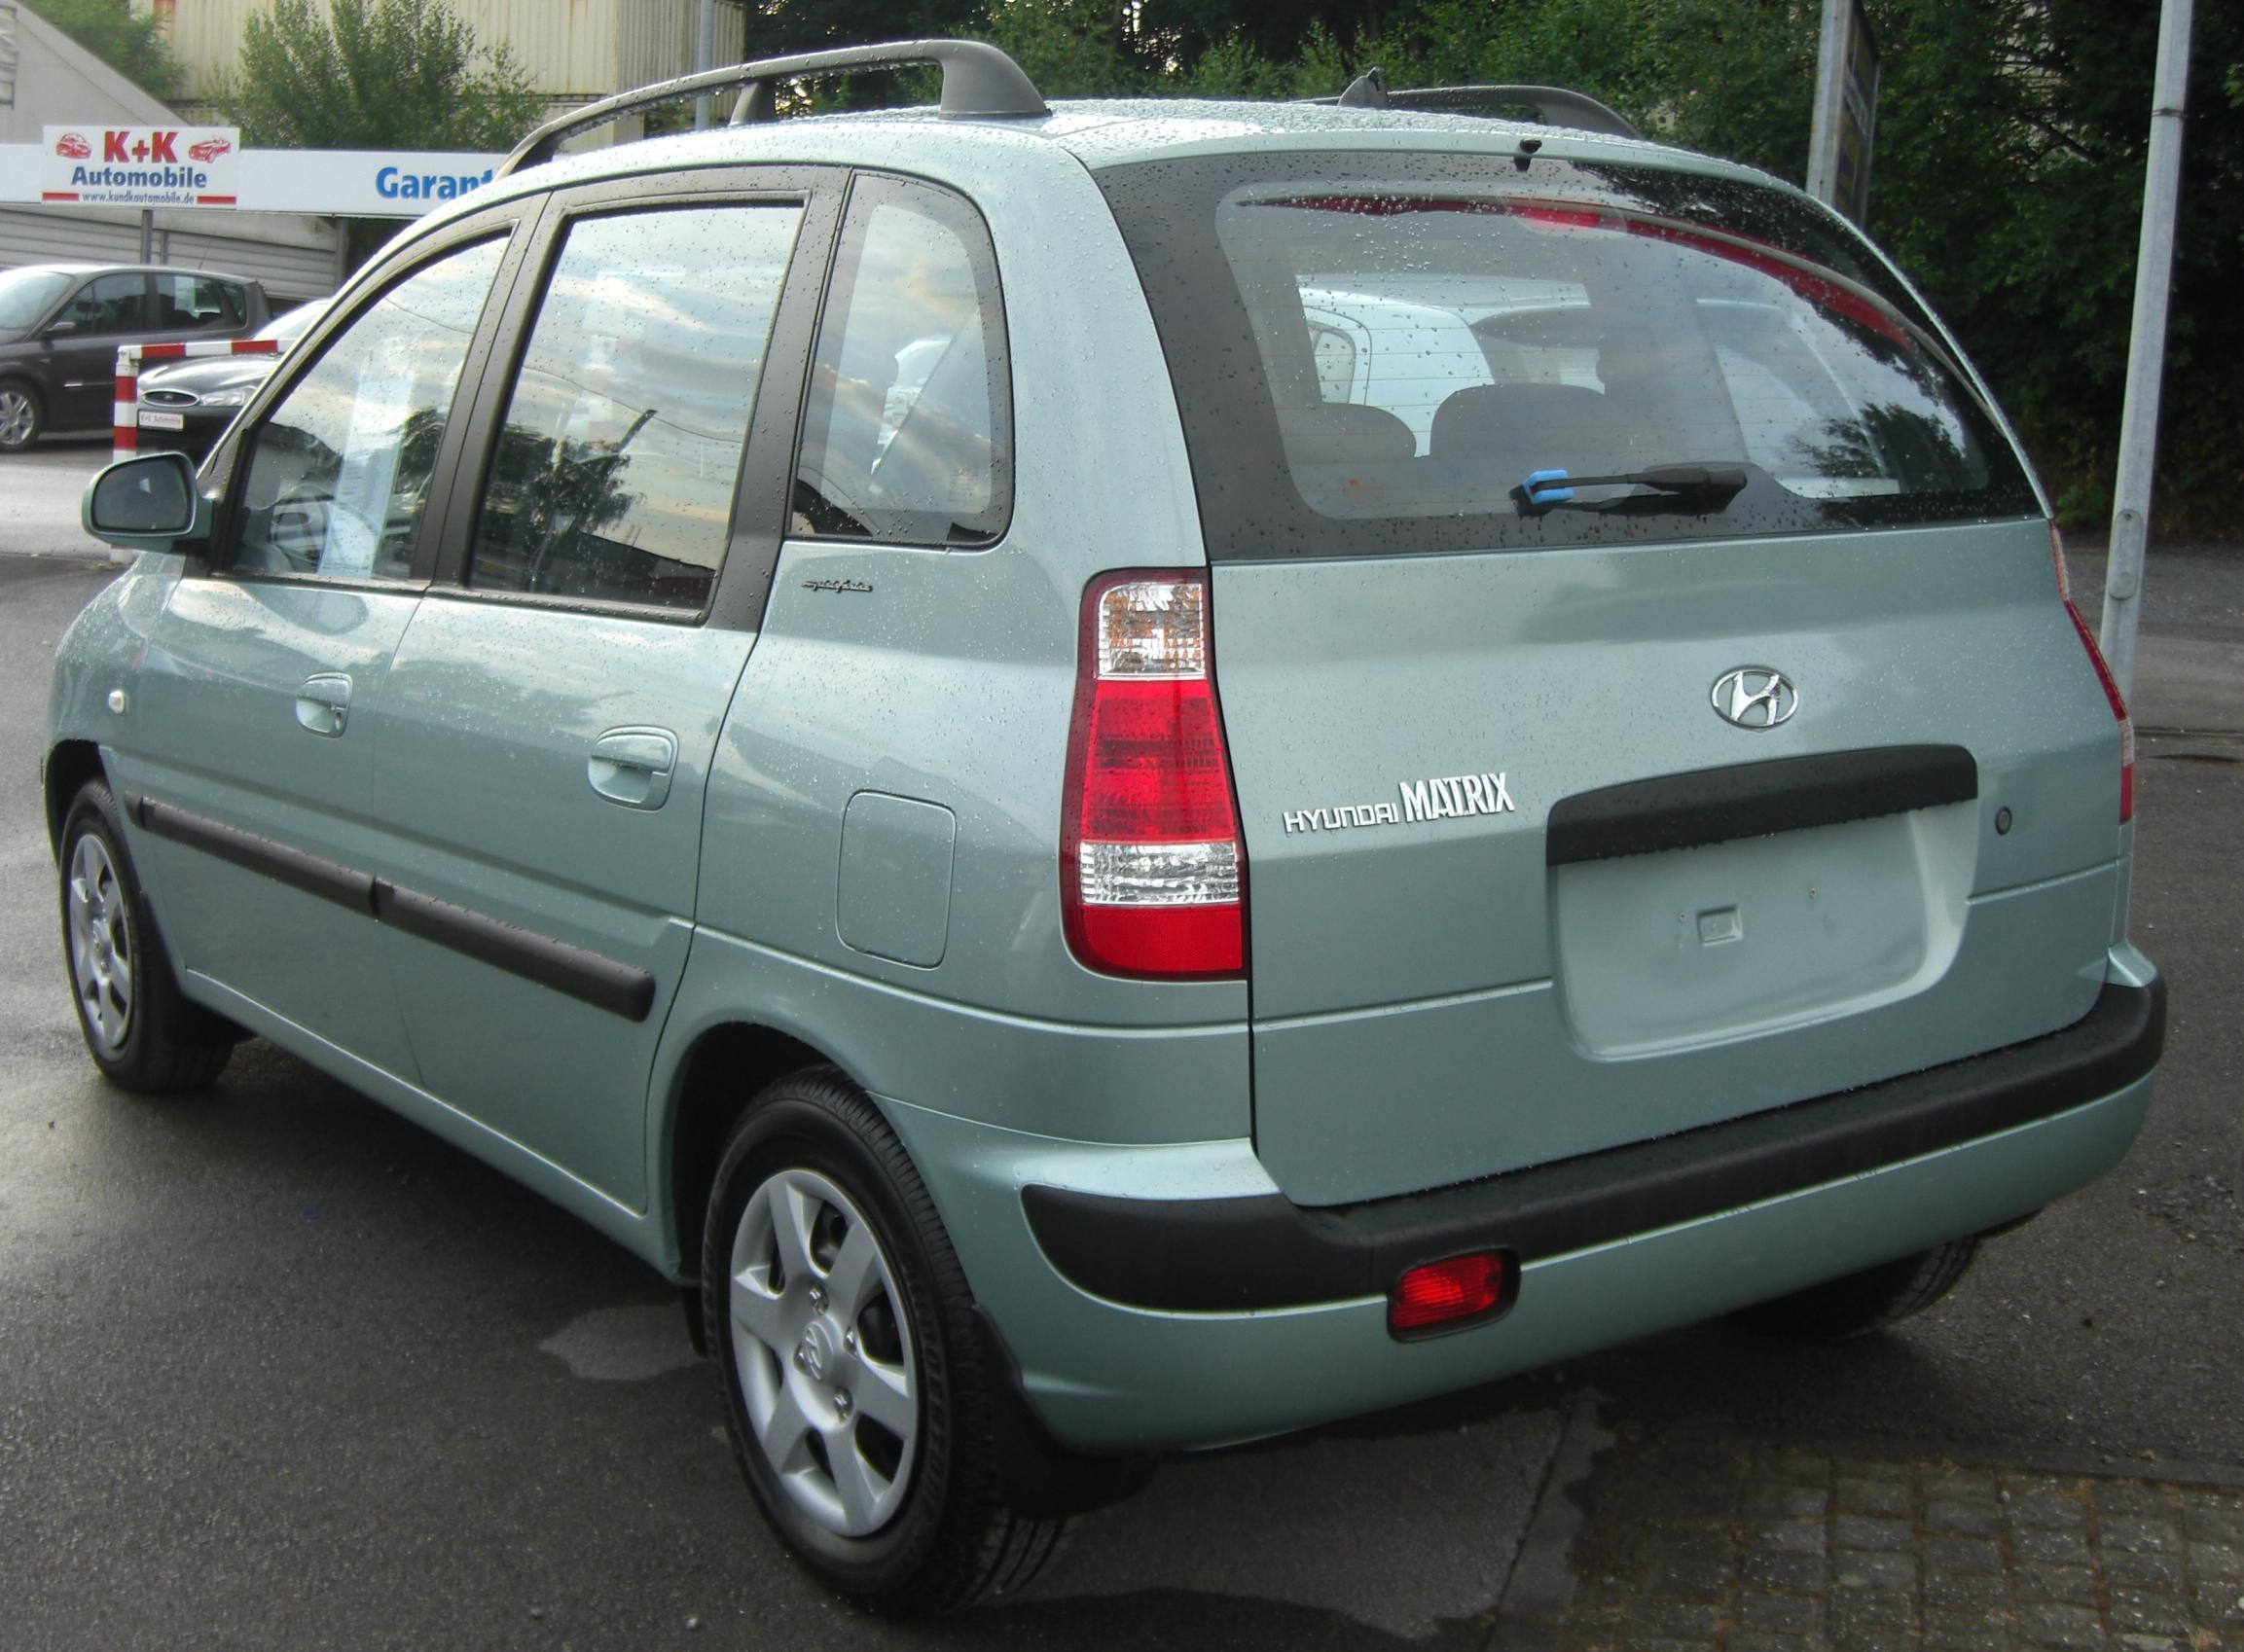 Hyundai Elantra Gls >> File:Hyundai Matrix Facelift (2005-2007) rear.jpg - Wikimedia Commons